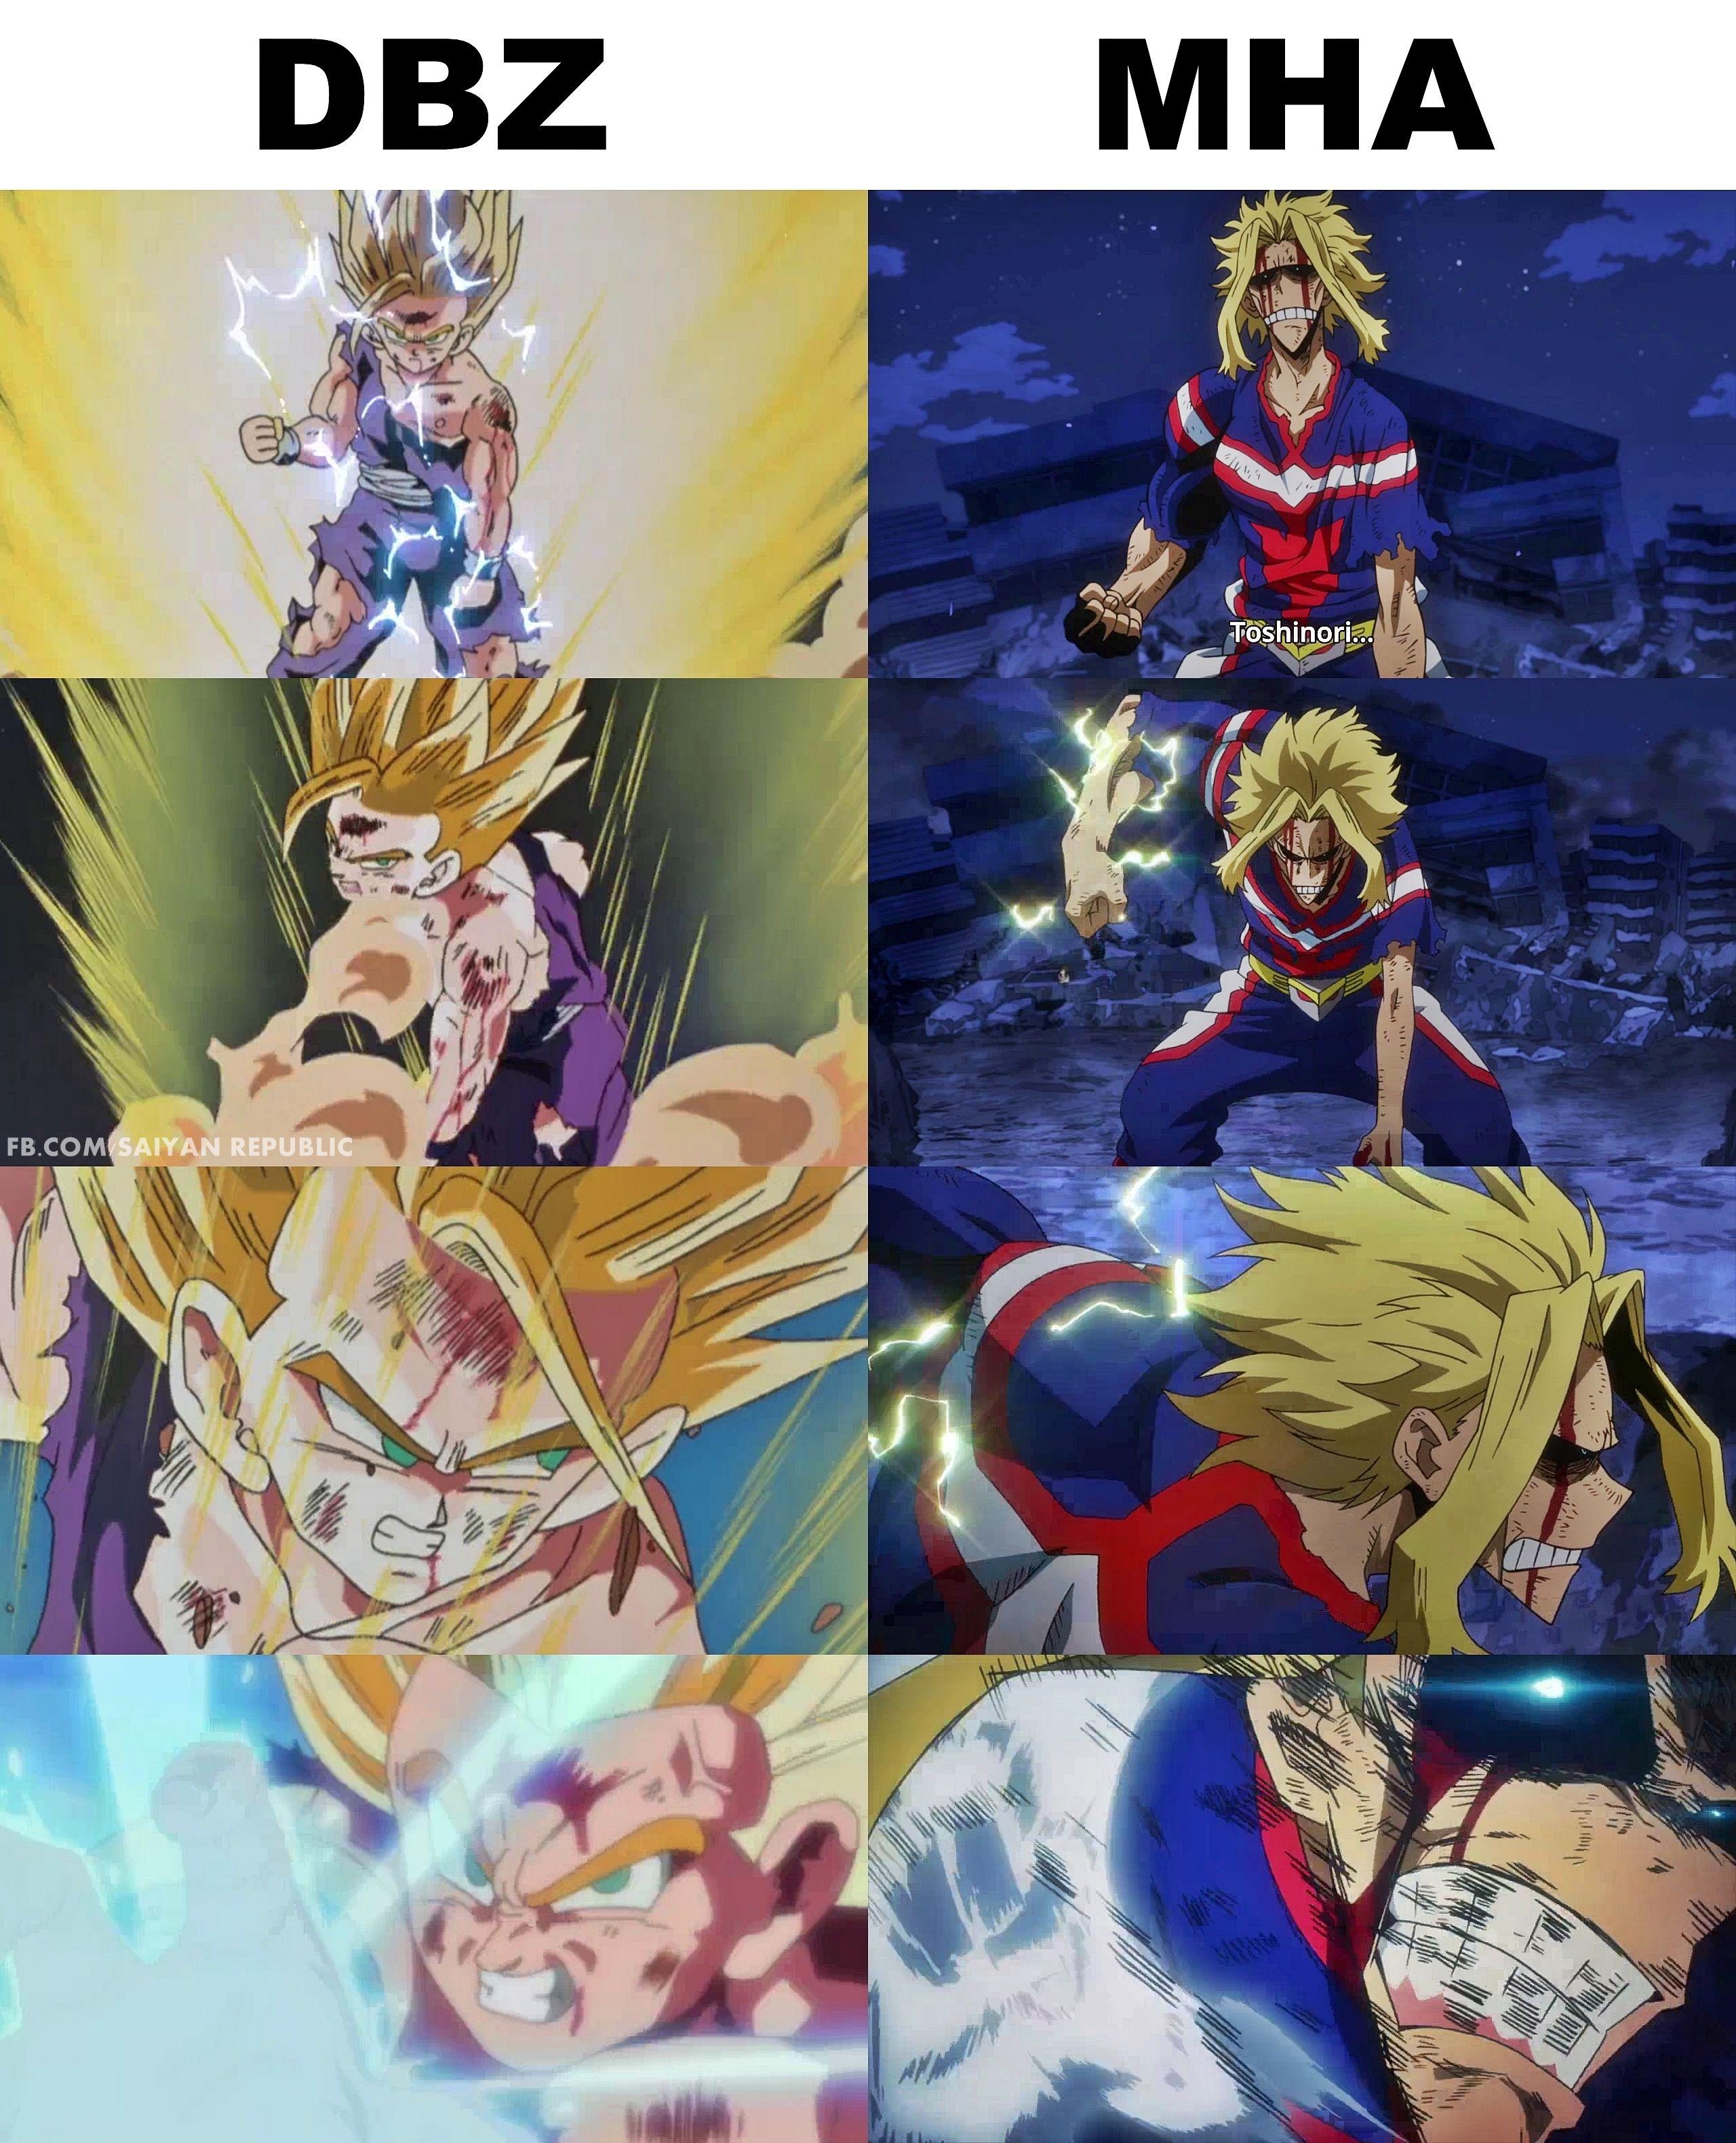 DBZ Reference in My Hero Academia | Anime, Anime dragon ...